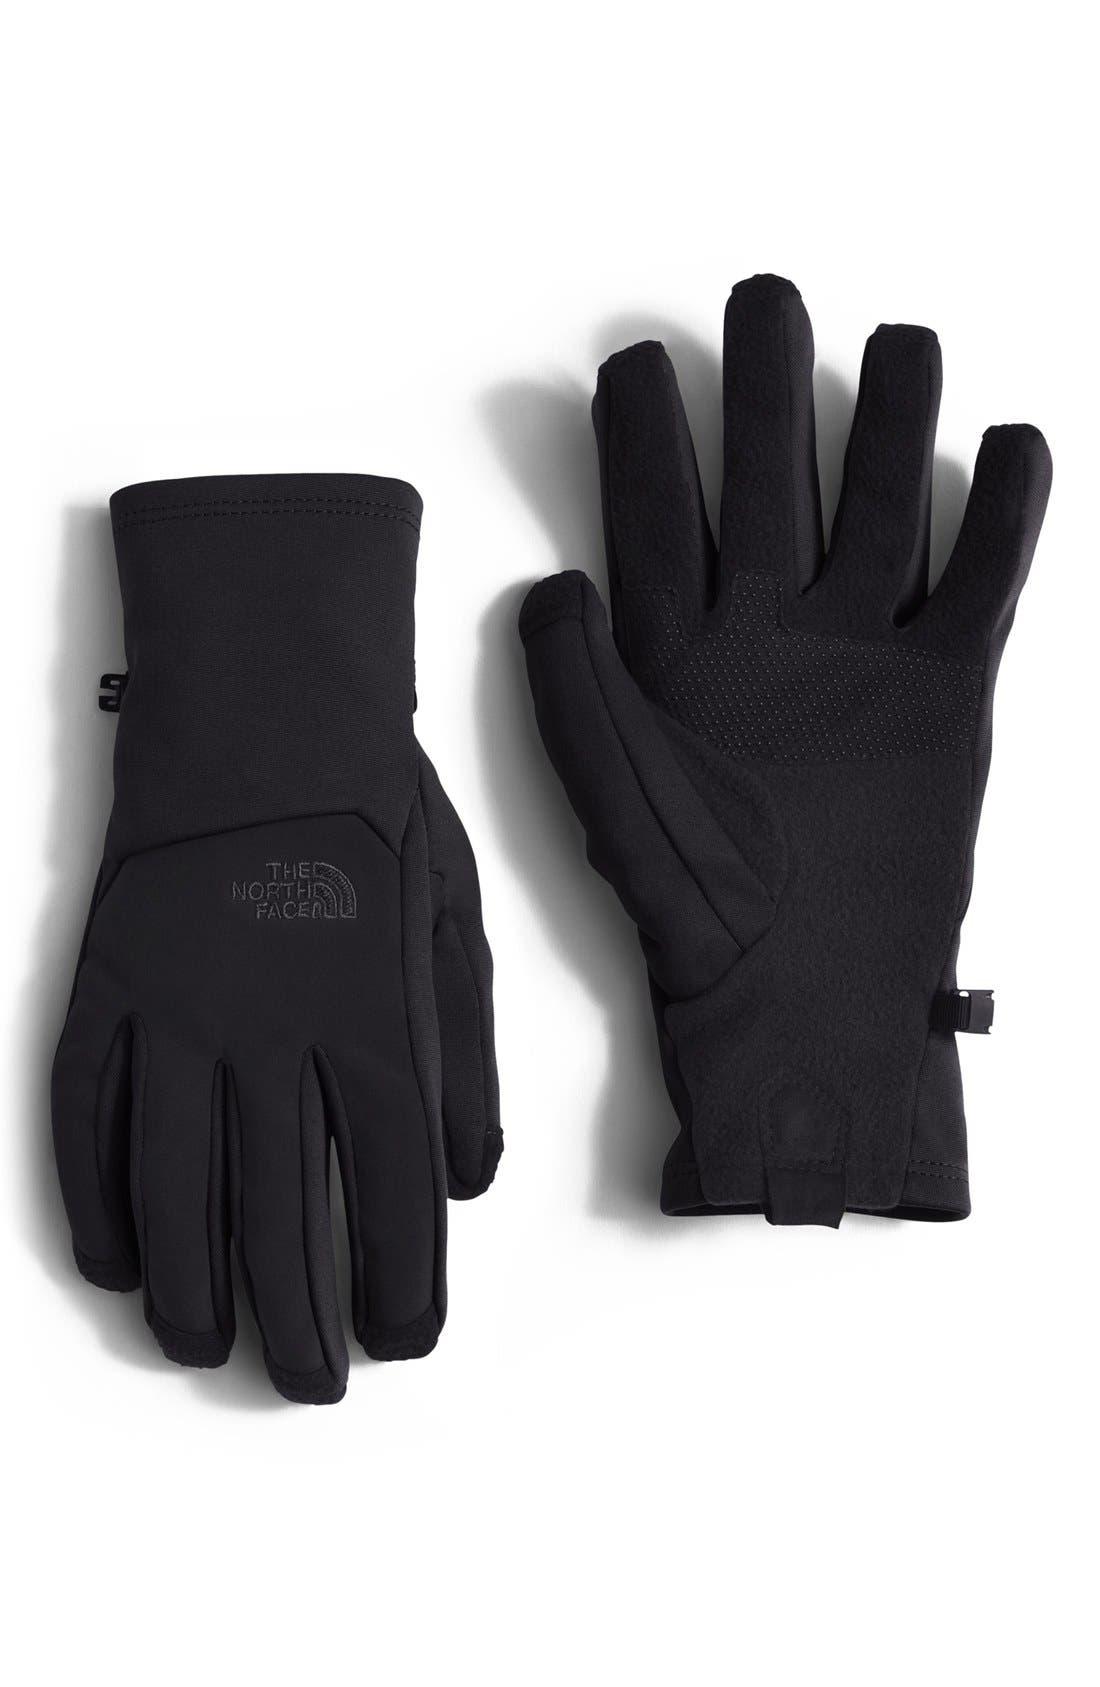 'CanyonWall E-Tip' Tech Gloves,                         Main,                         color, North Face Black